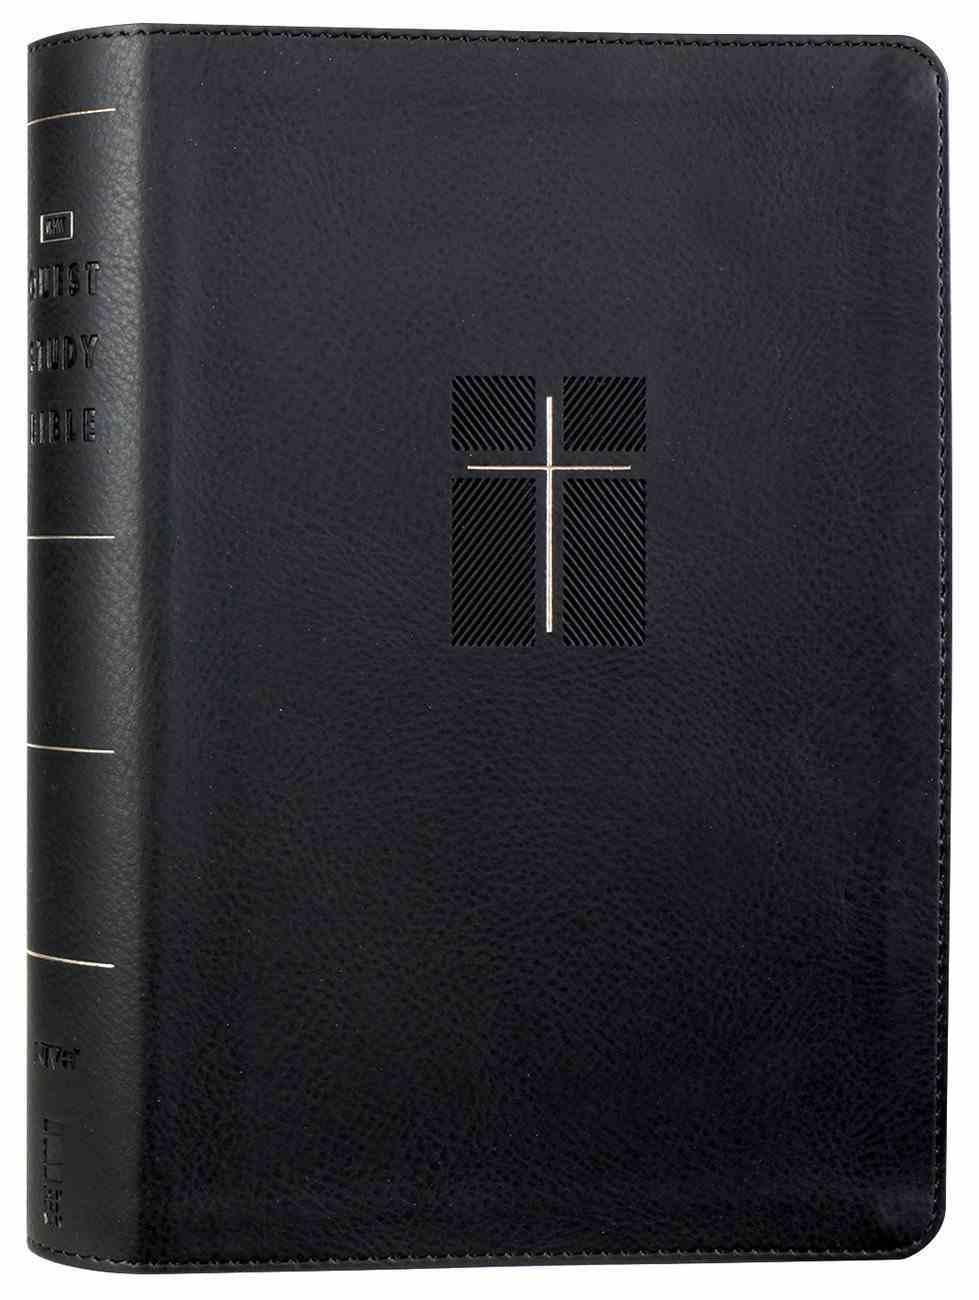 NIV Quest Study Bible Black Premium Imitation Leather